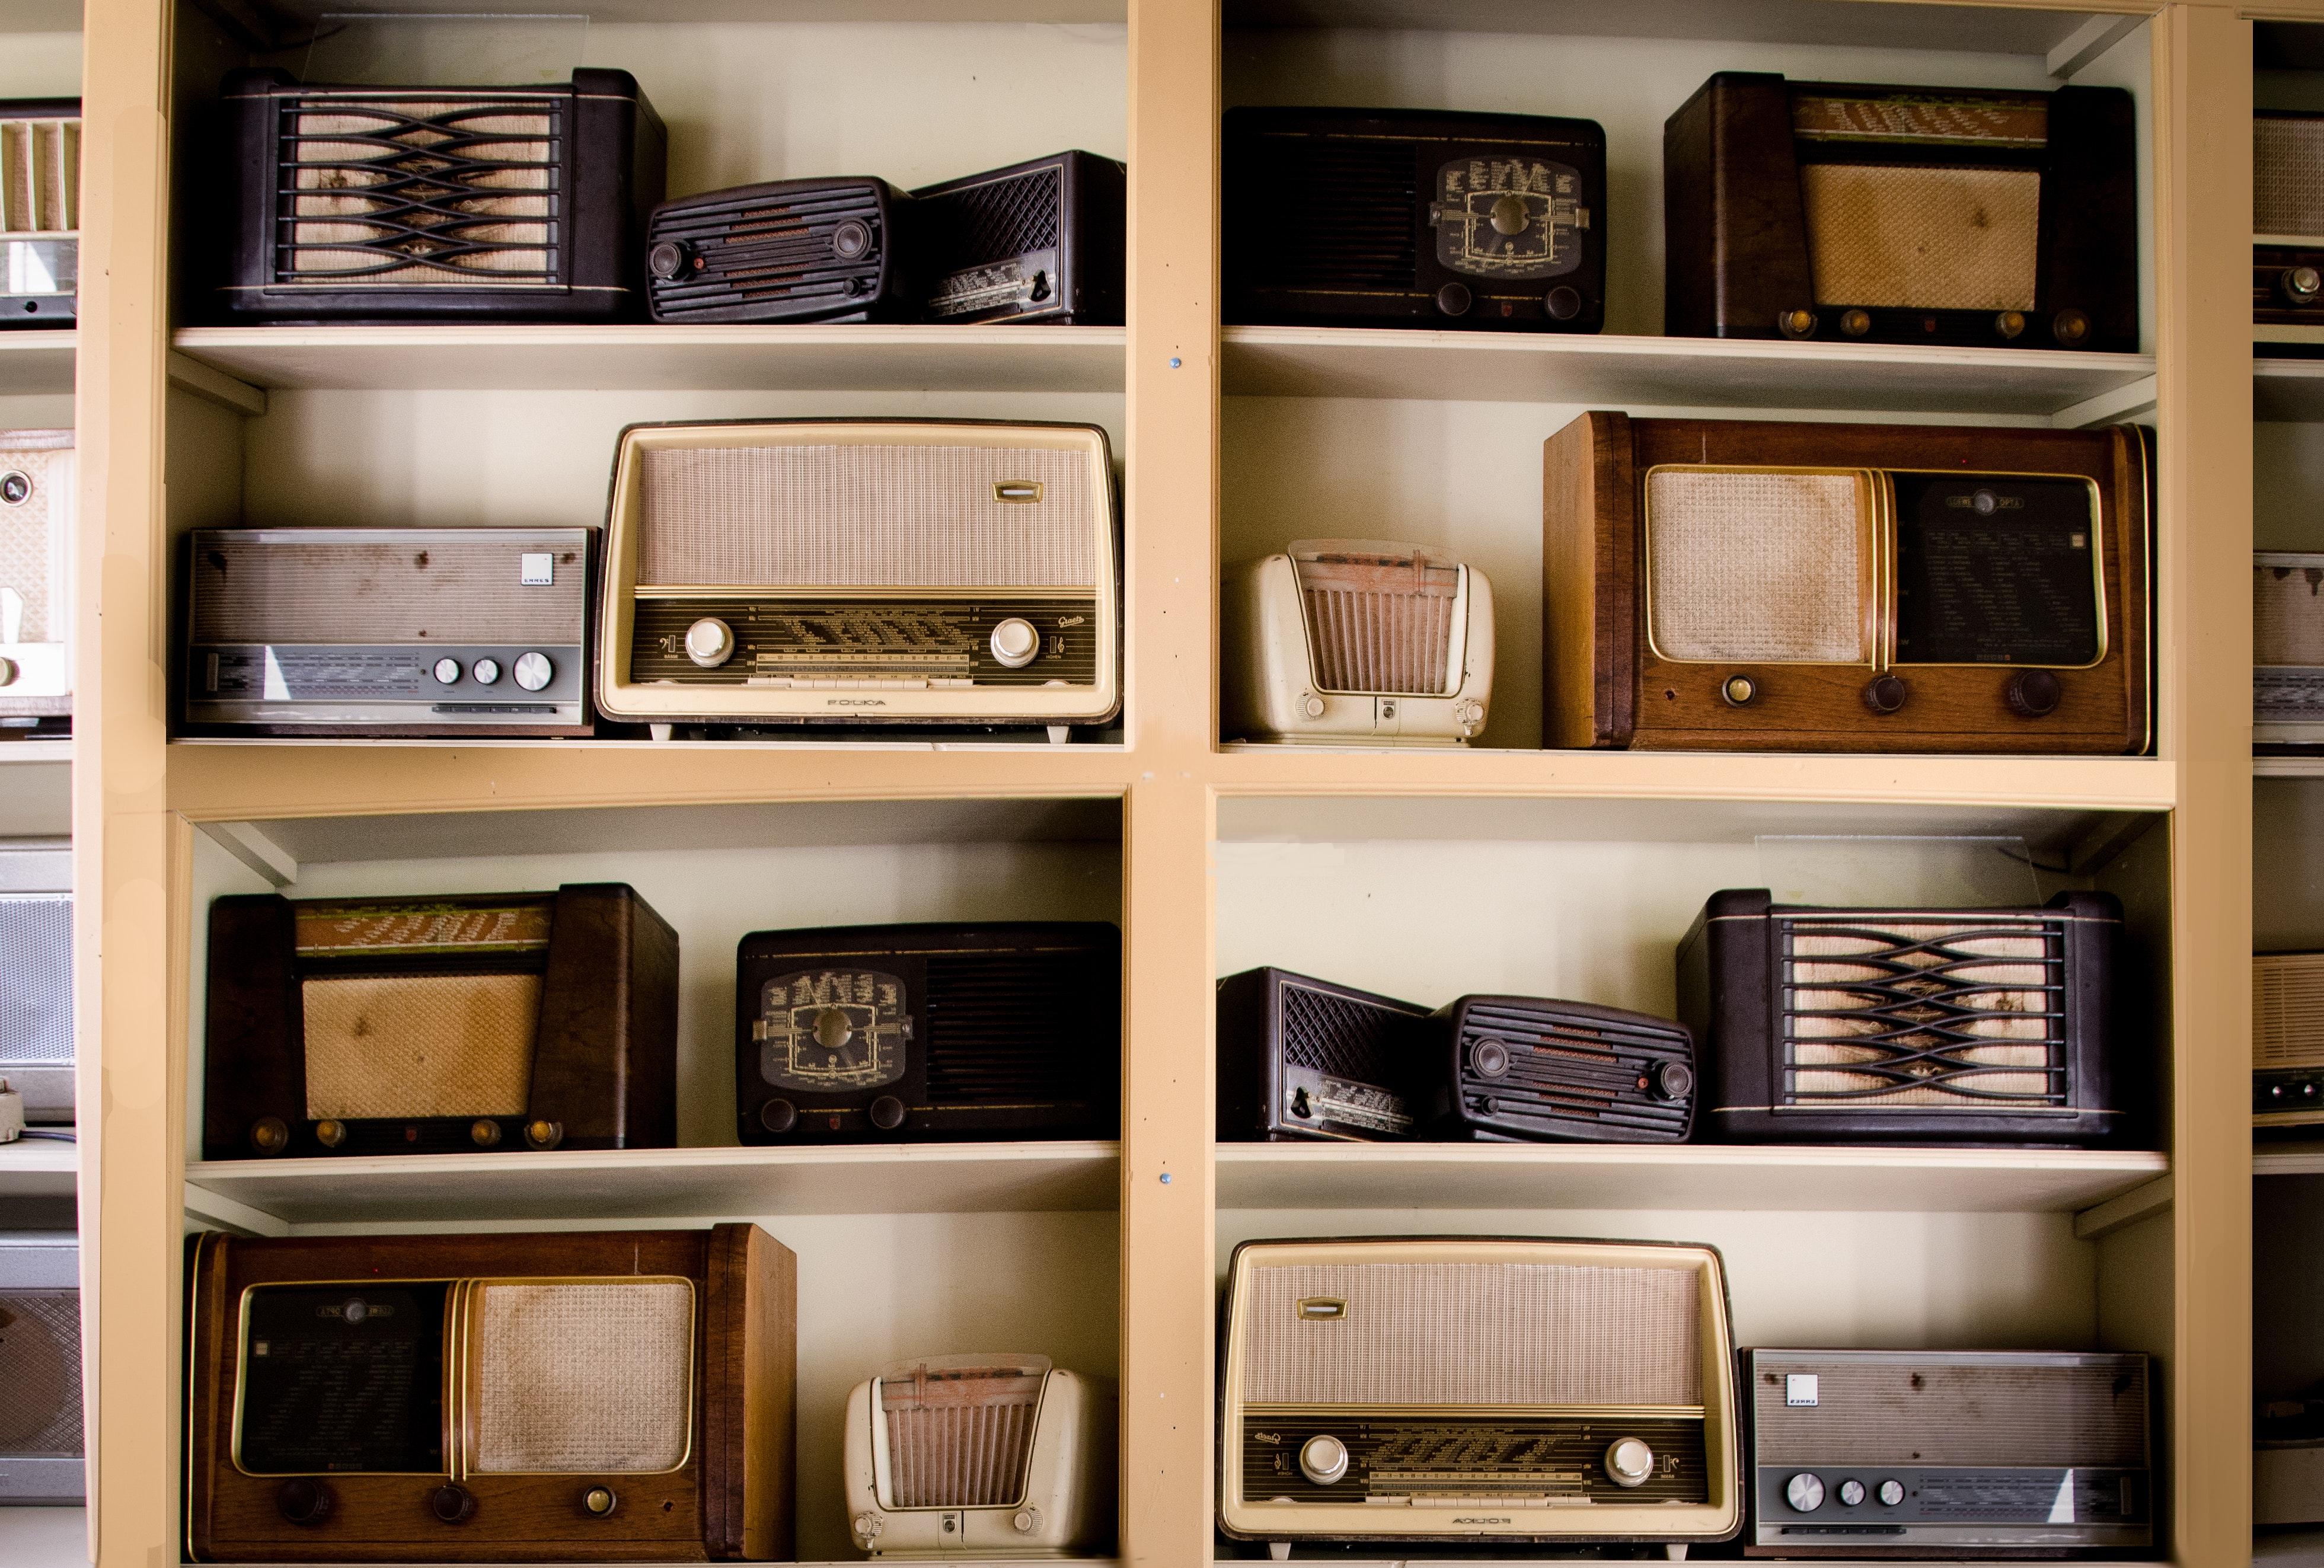 Intenet Radio Nostalgie